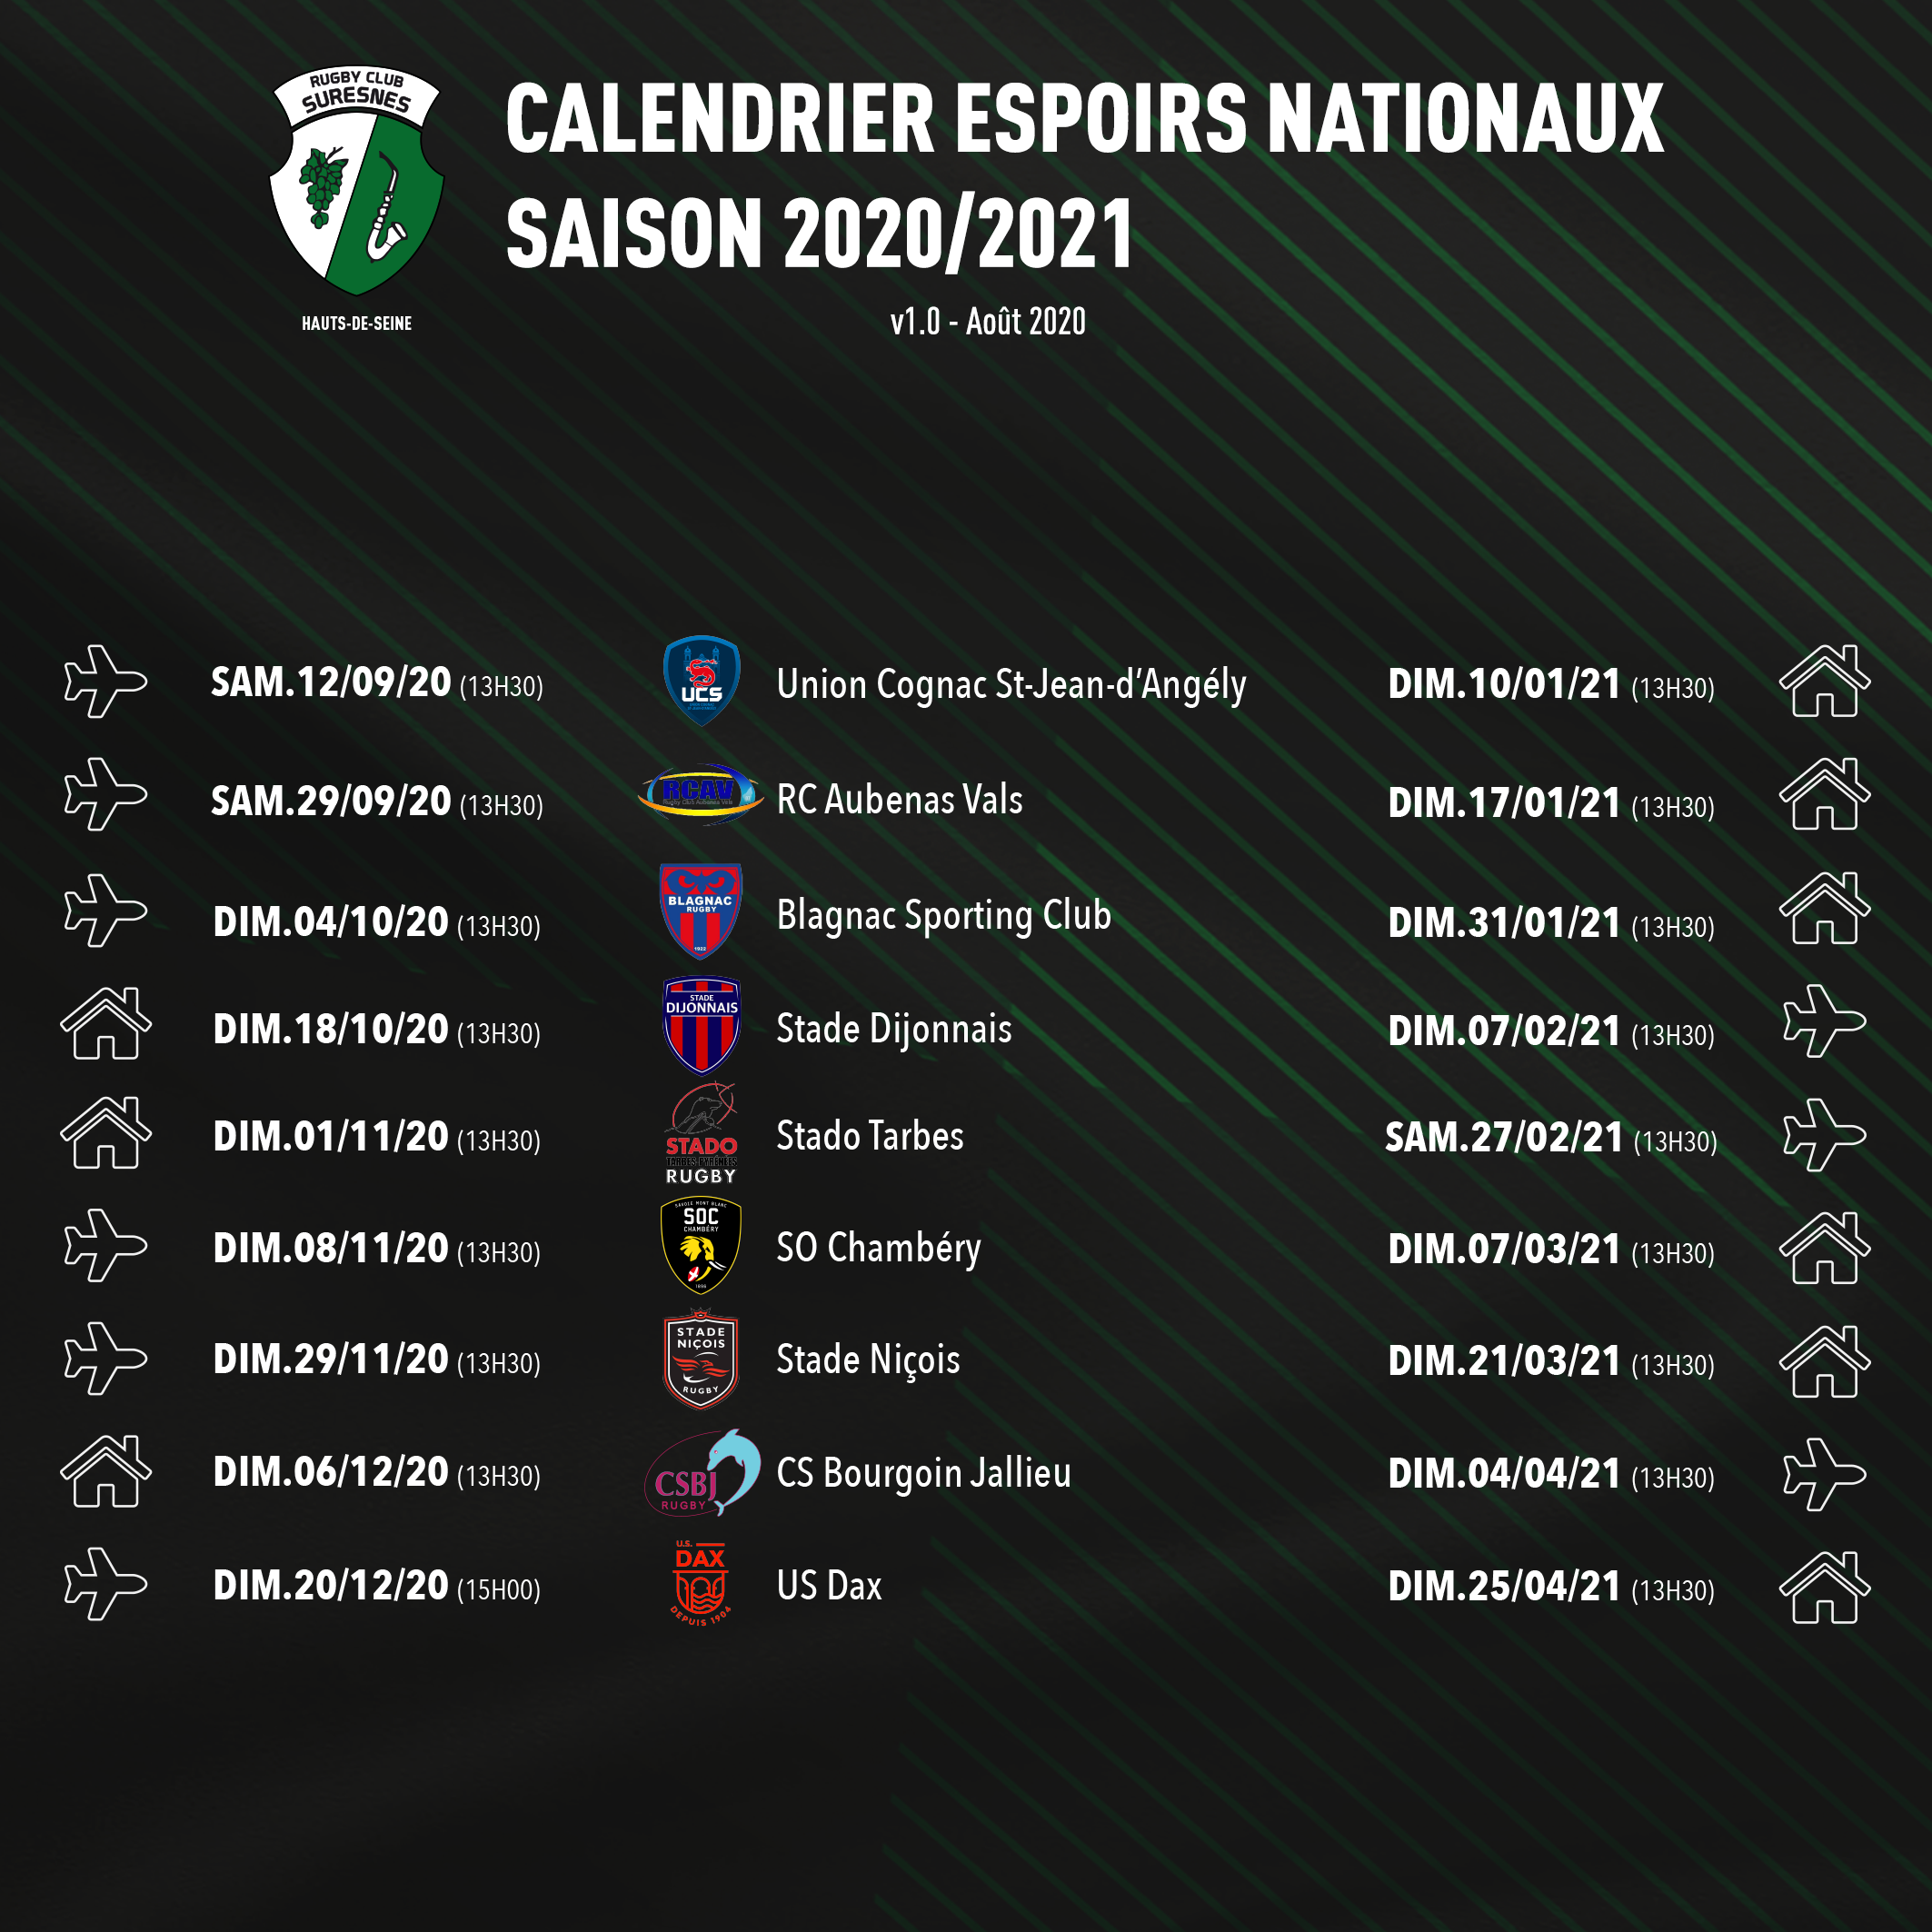 Calendrier championnat Espoirs Nationaux - RC Suresnes